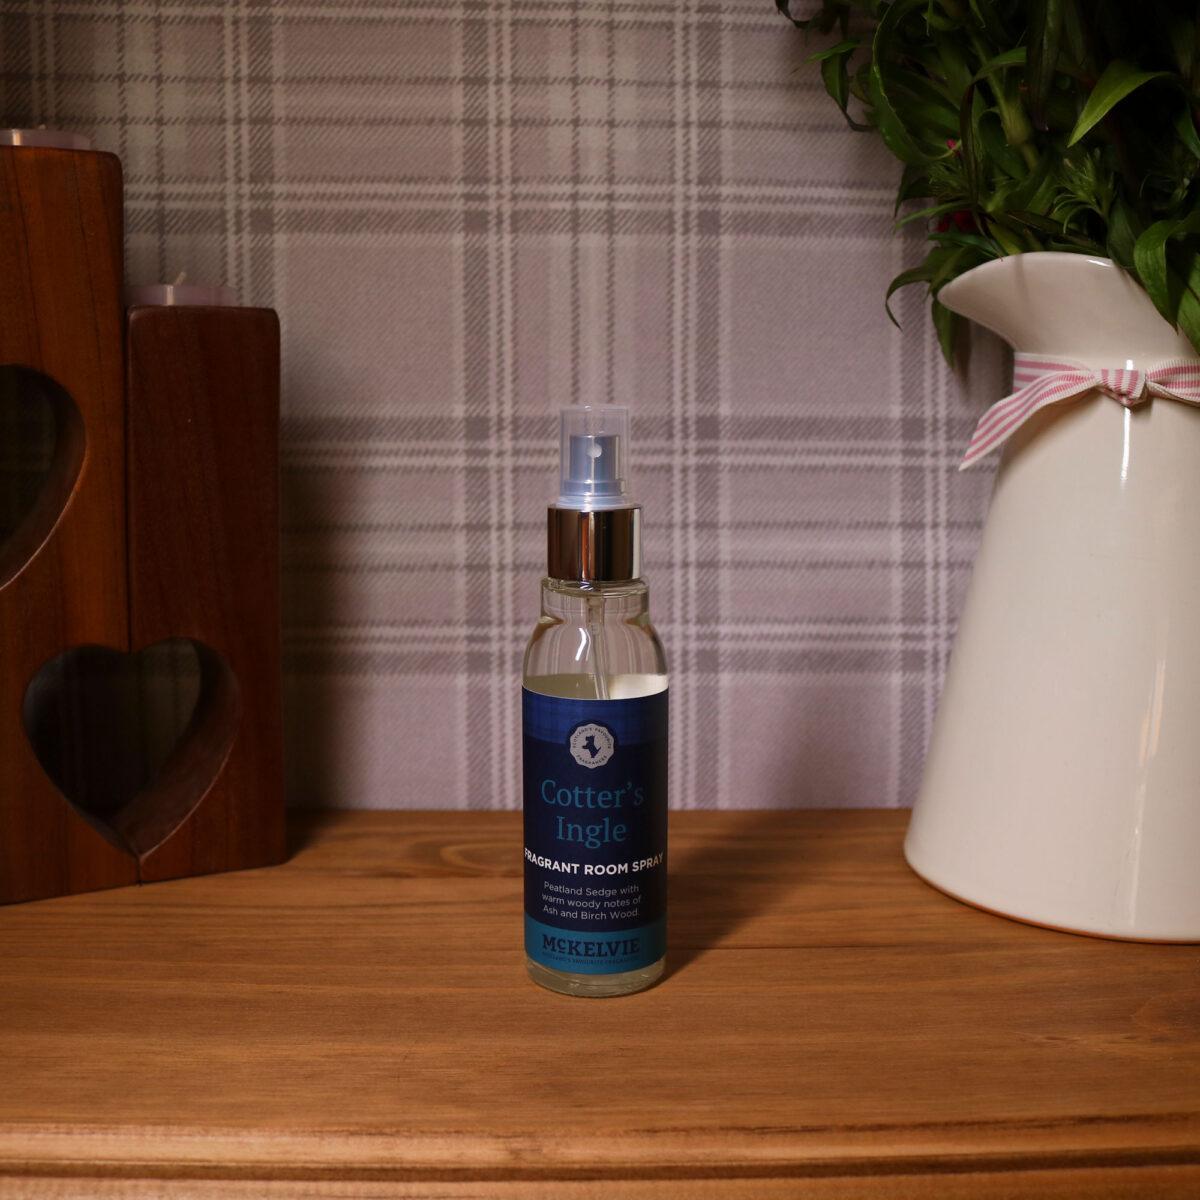 Cotter's Ingle Fragrant Room Spray